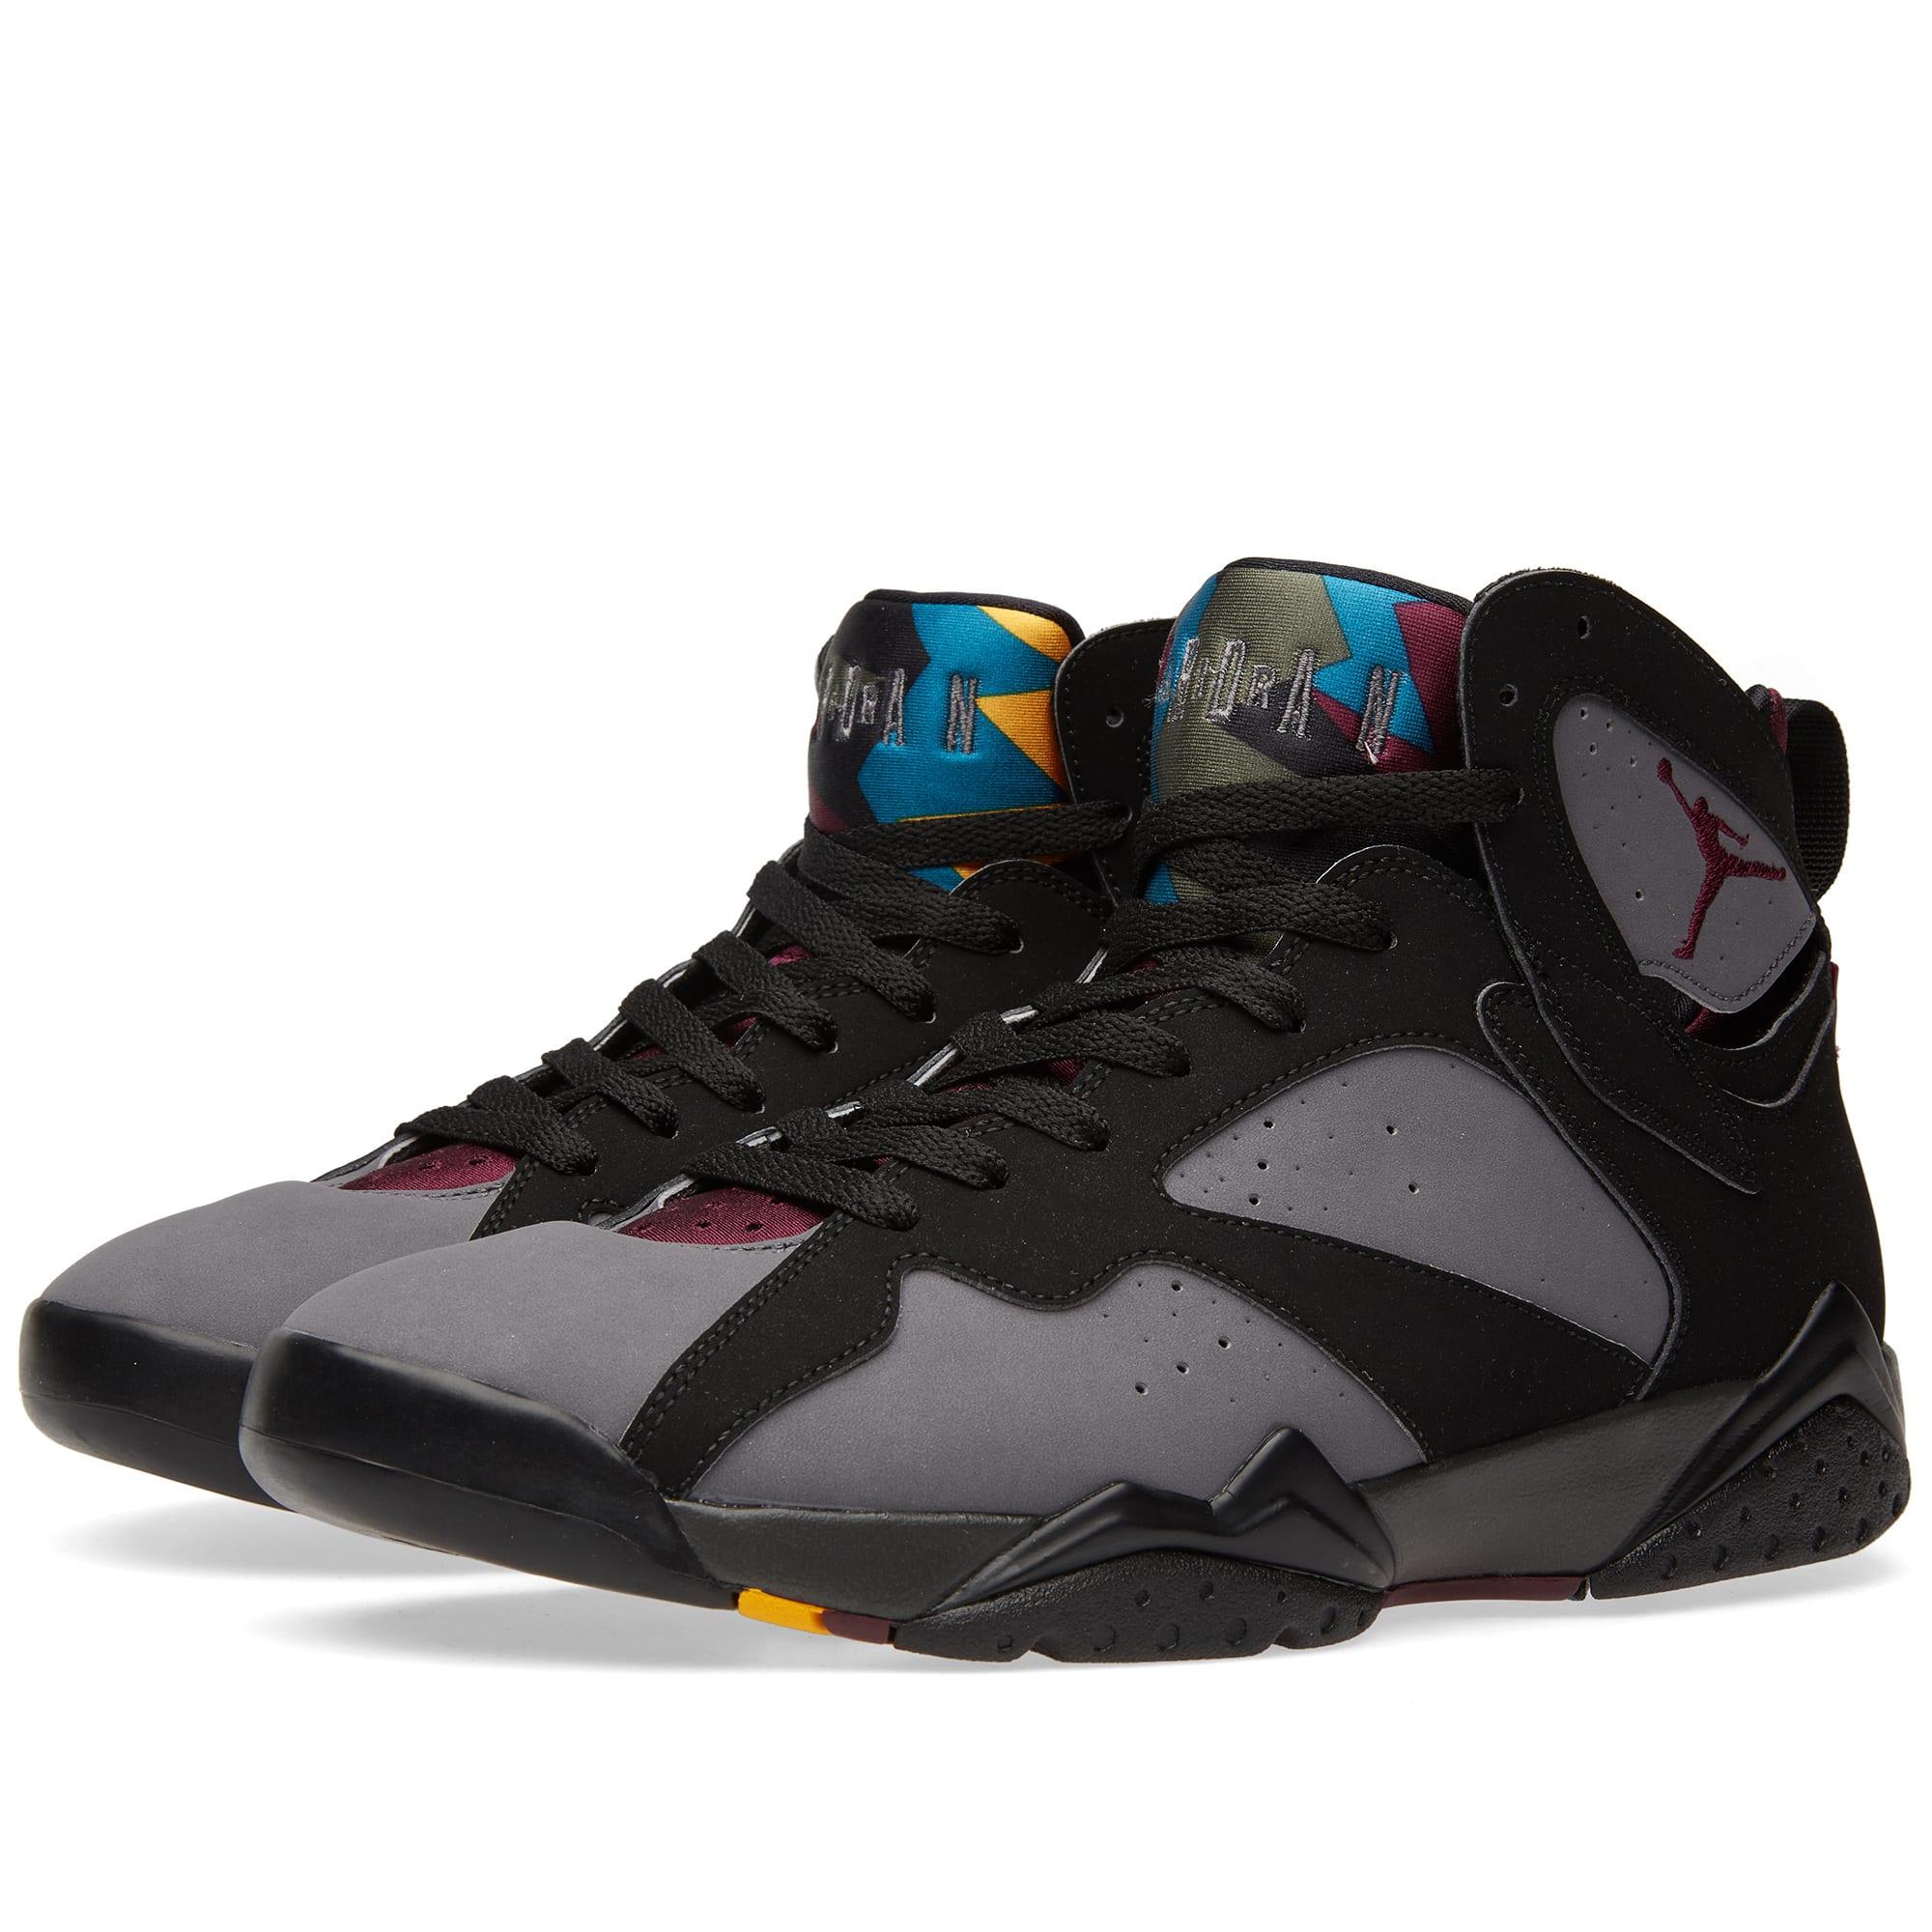 Nike air jordan vii retro black bordeaux graphite for Retro bordeaux